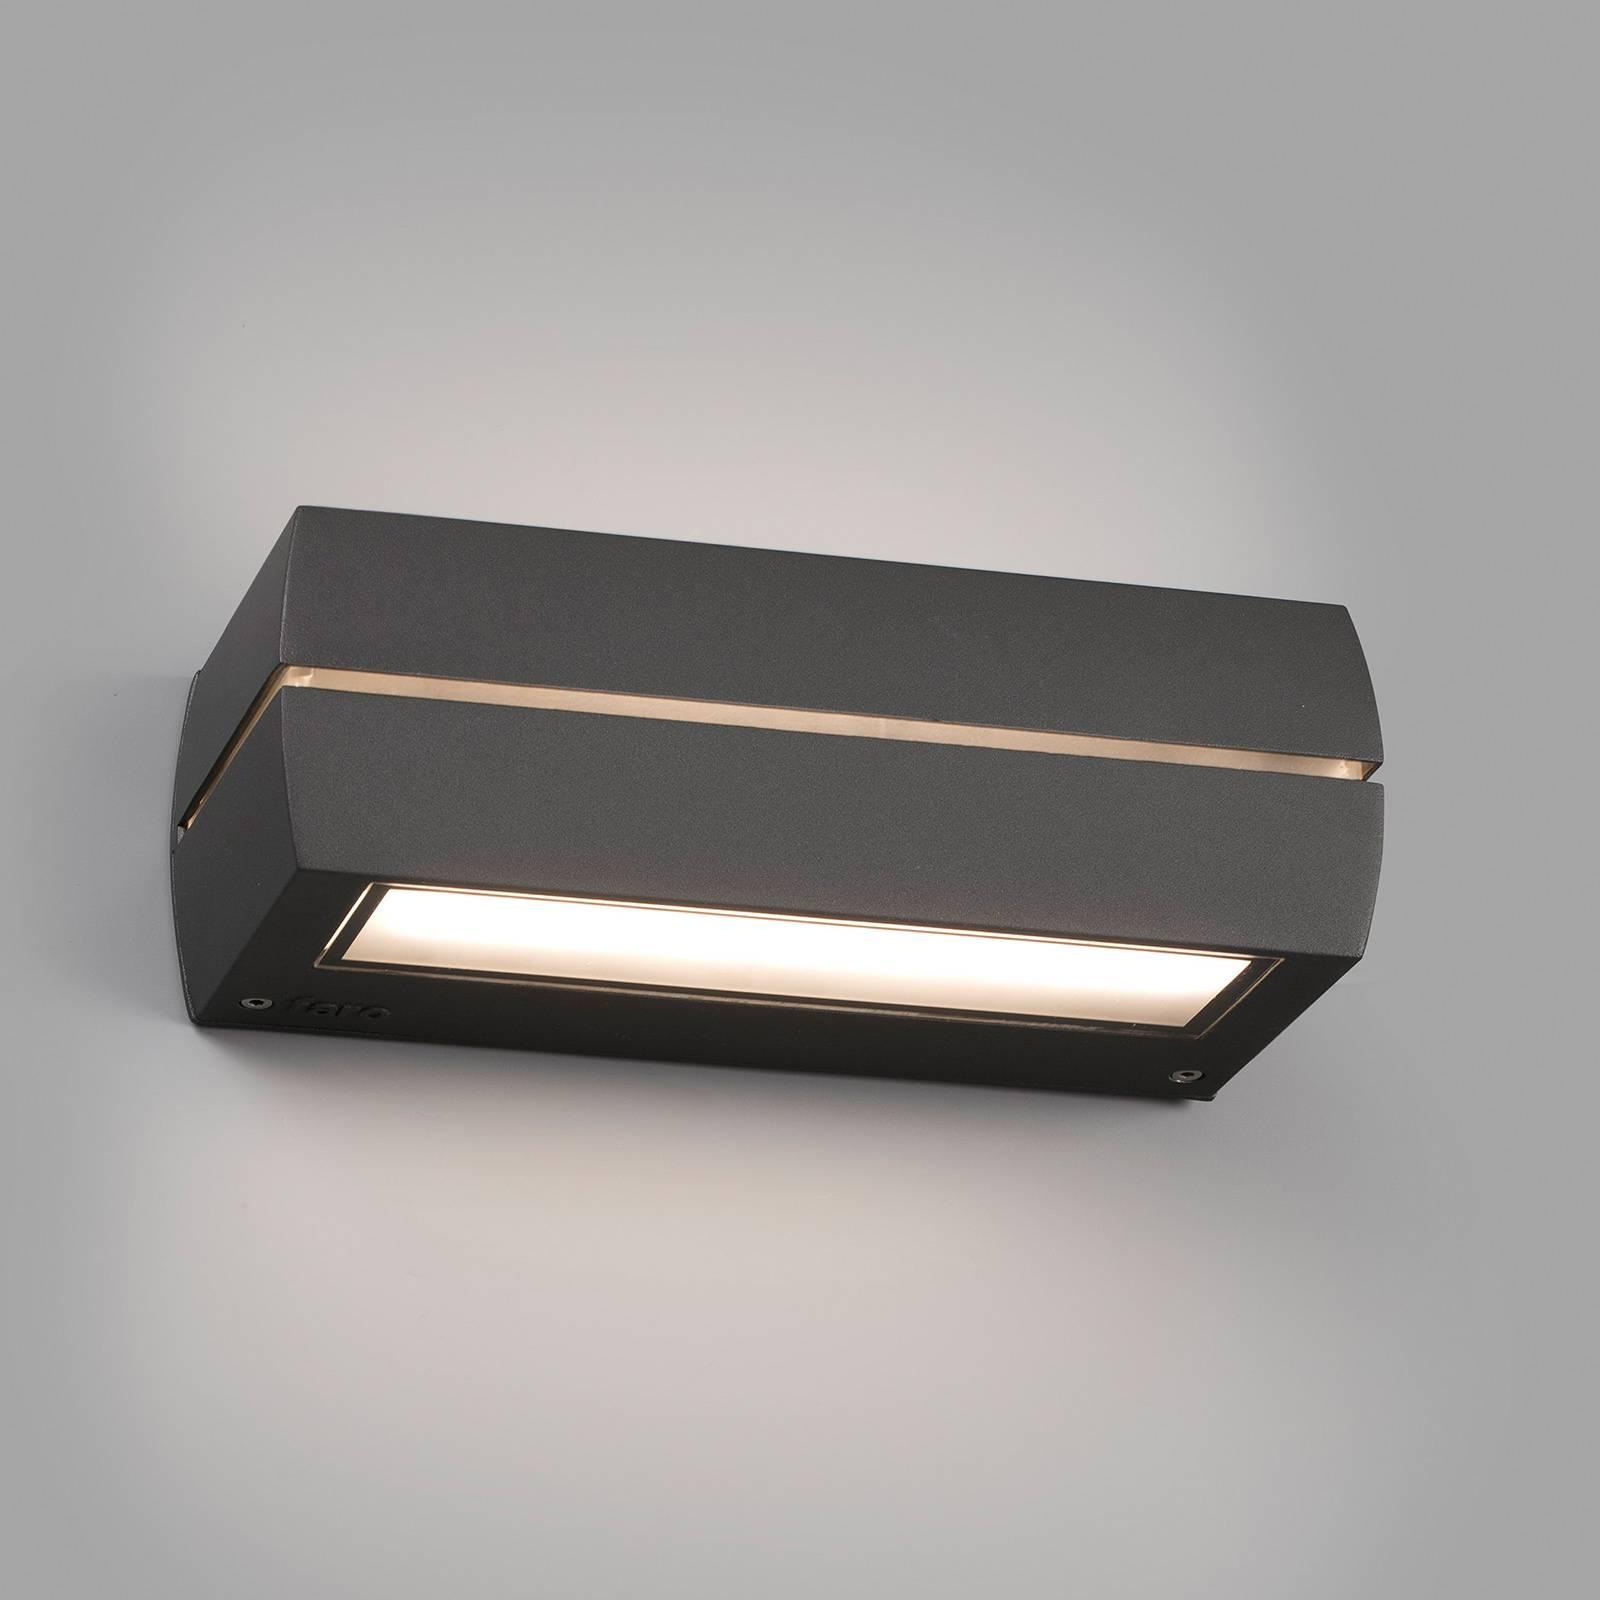 LED-ulkoseinälamppu Dragma